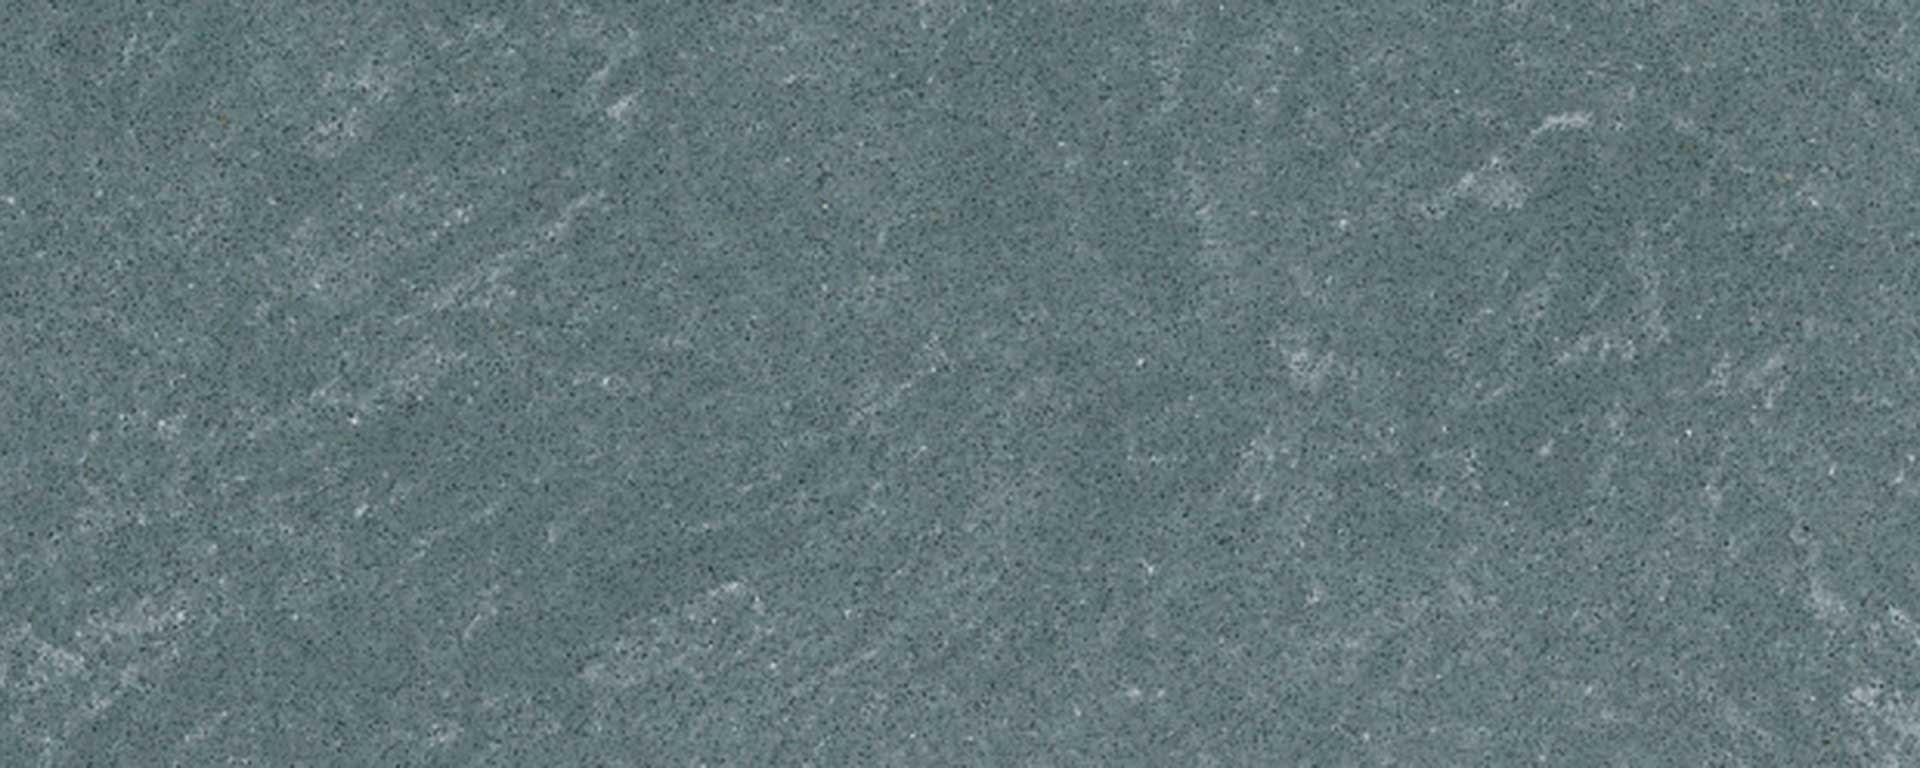 MMDR-013-terrazzo-marmo-resina-w